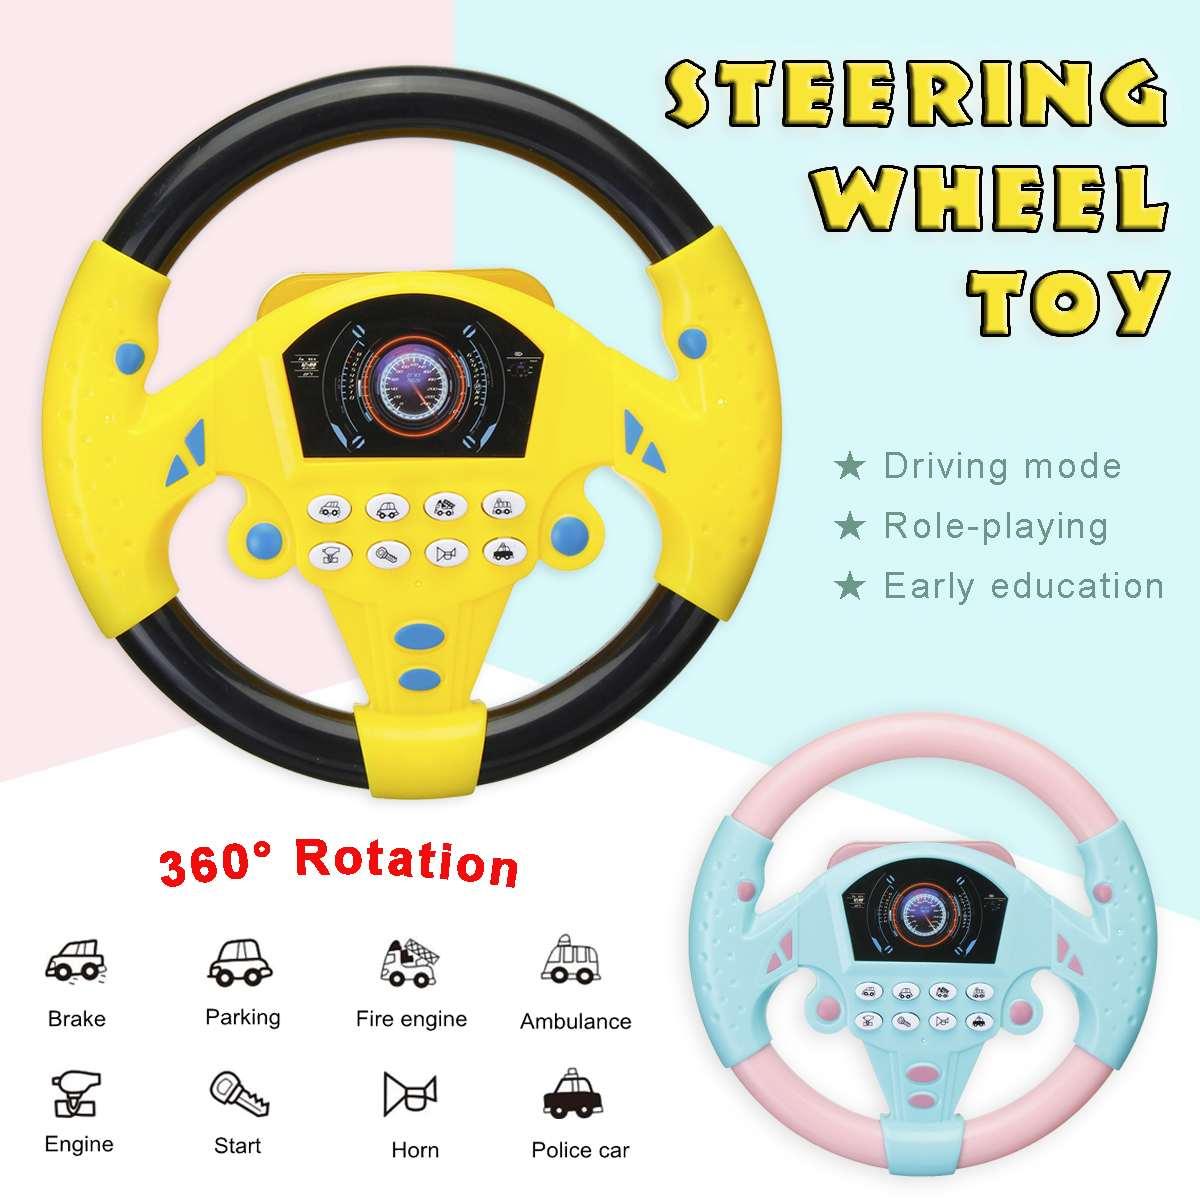 Simulation Steering Wheel Sports Car Steering Wheel Toy Portable Pretend Play Toy Steering Wheel for Kids Educational Toys for Children